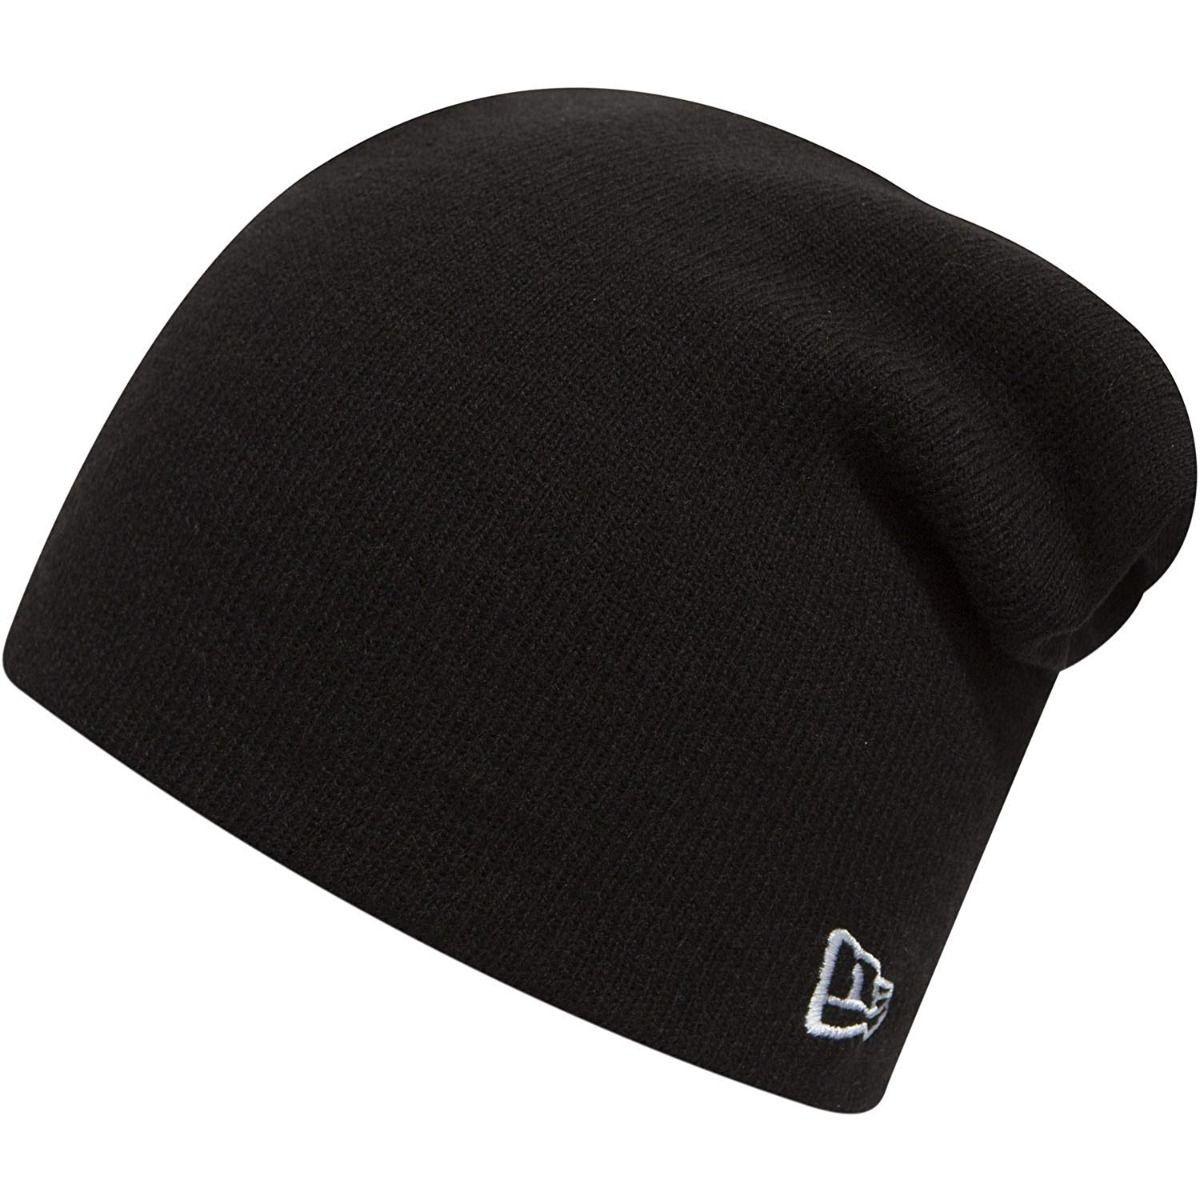 430541b3d08af New Era Essential Long Knit Beanie - Black   Optic White